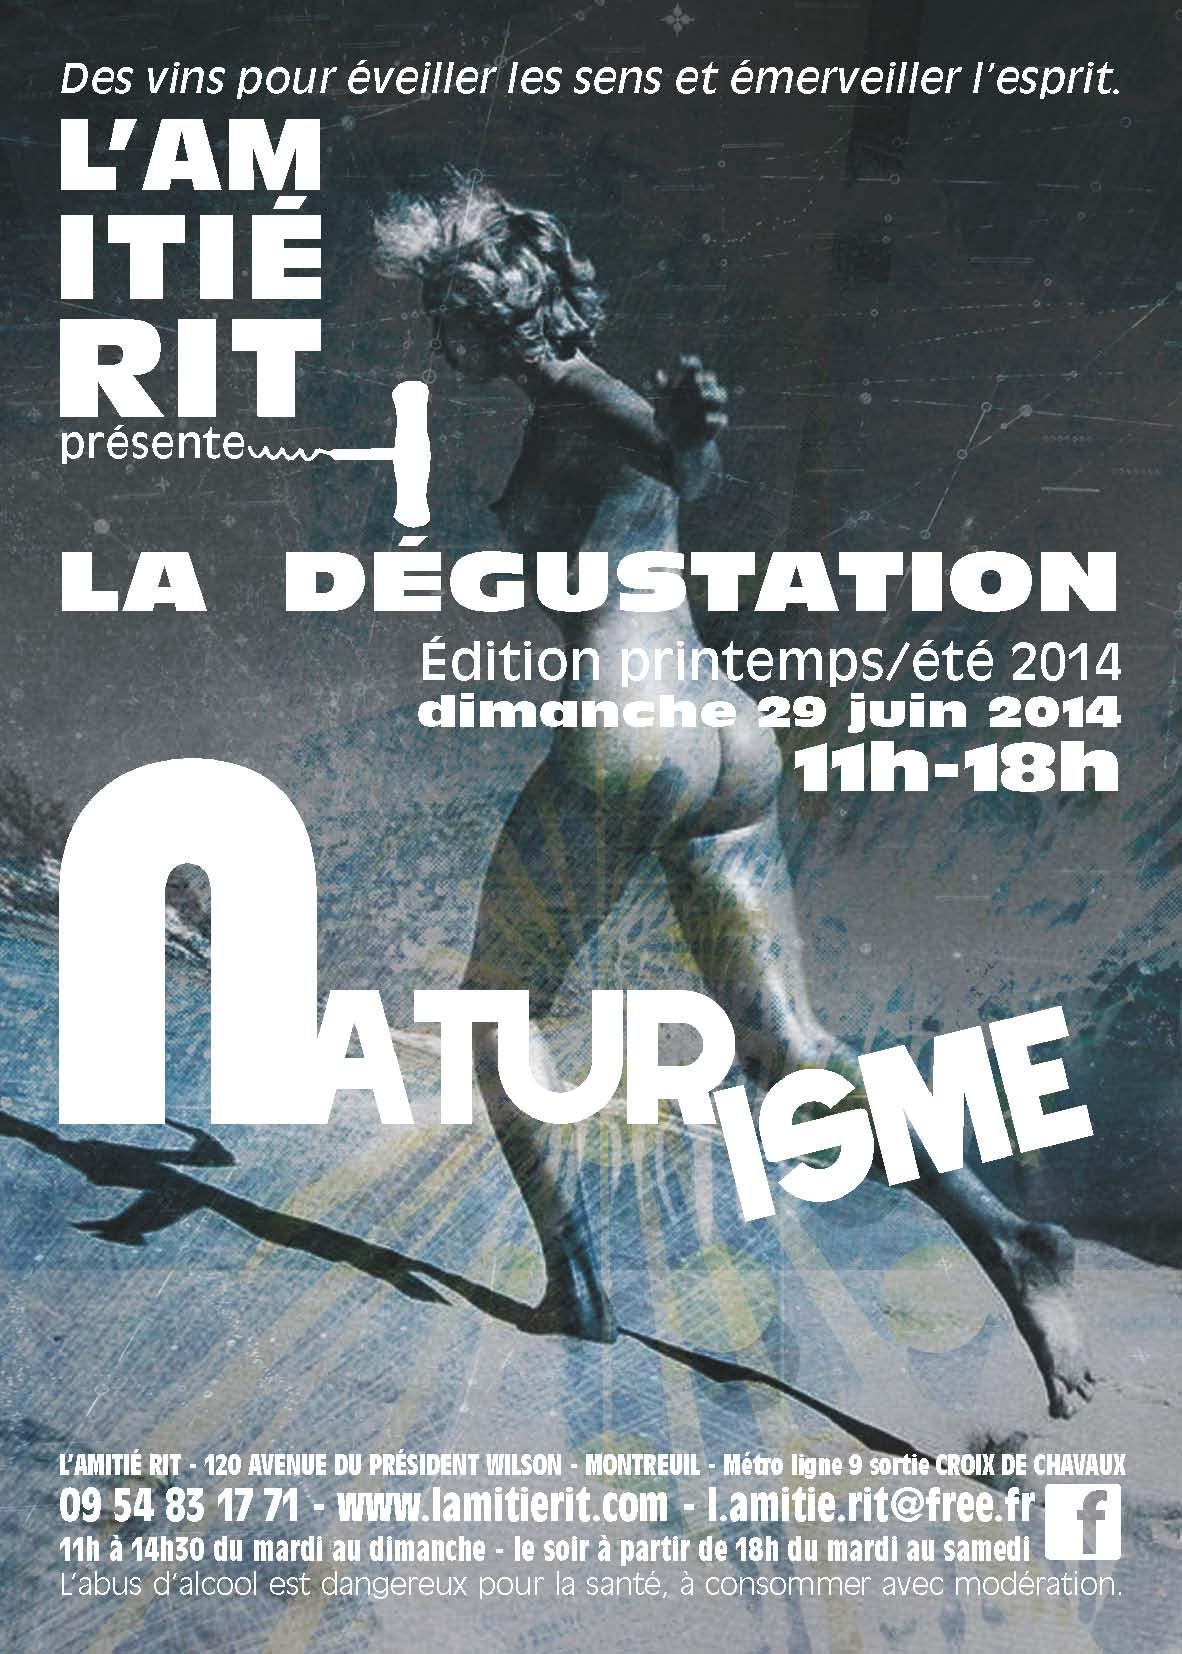 flyers recto verso naturisme juin 14_Page_1 copie